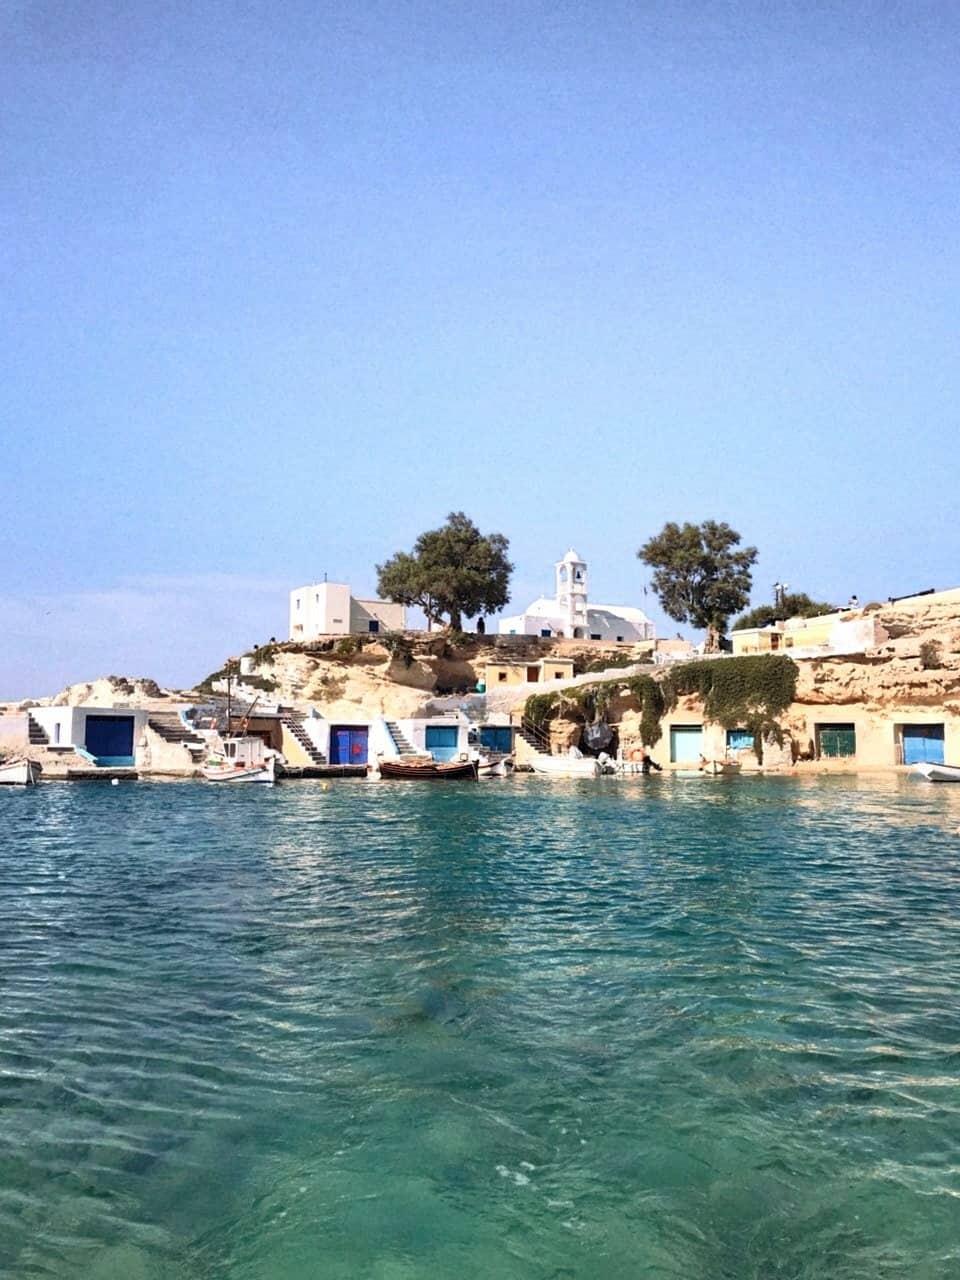 Mandrakia Milos: The Prettiest Fishing Port You Ever Did See, Milos, Cyclades Islands, Aegean Sea, Greece